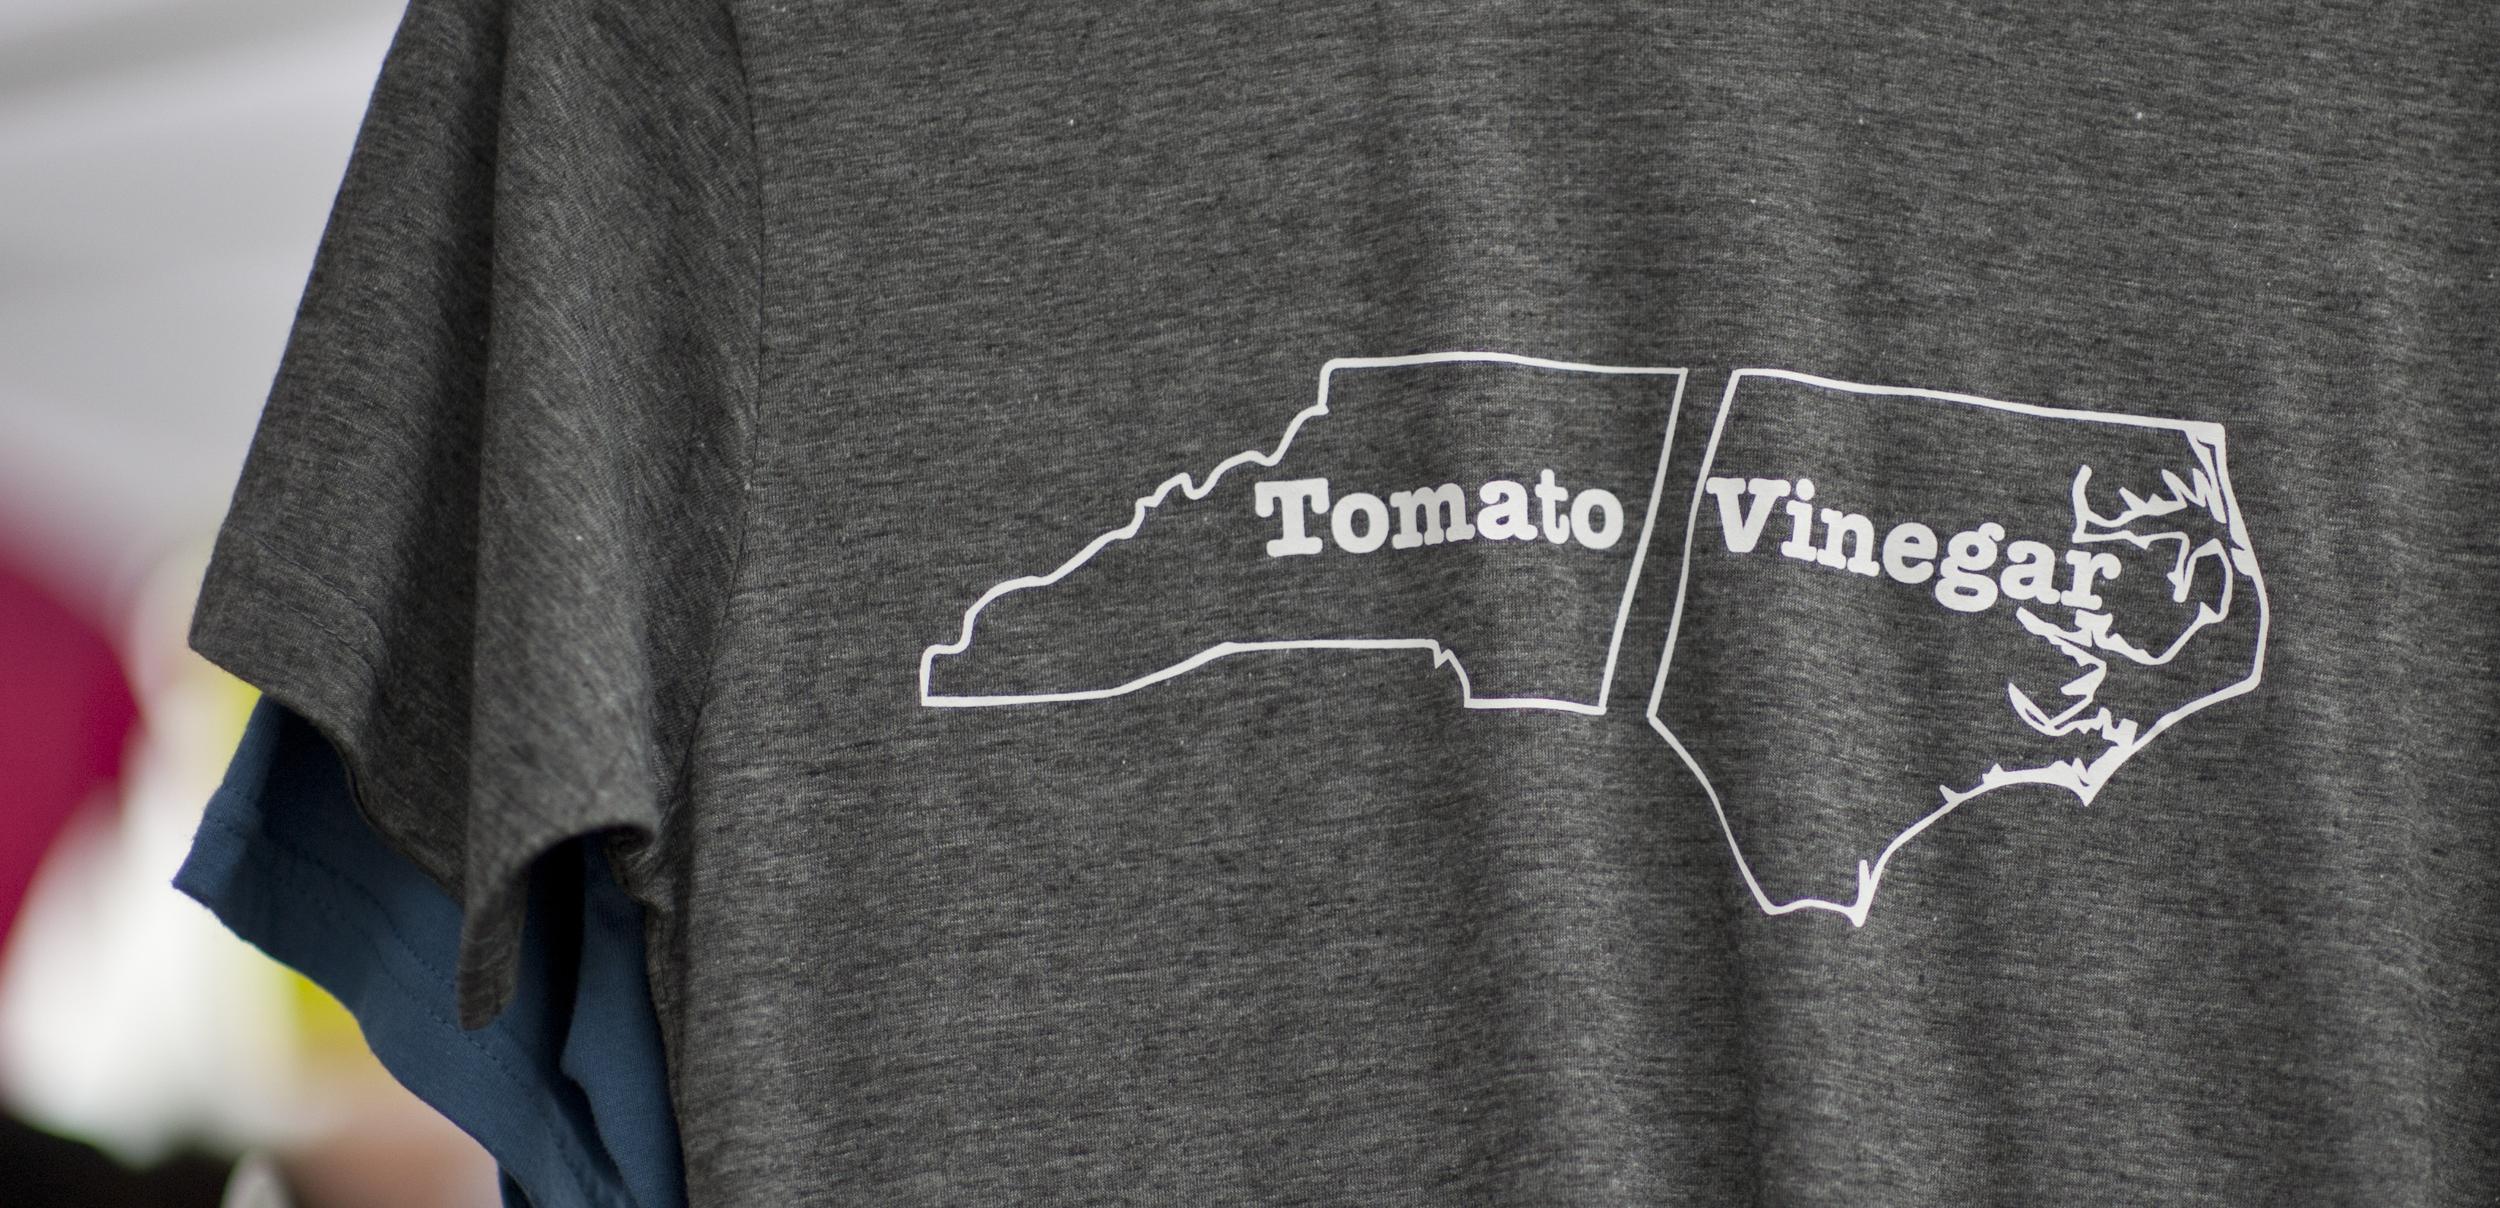 Durham_FoodTruckRodeo_TomatoVinegarTShirt_11172013.jpg